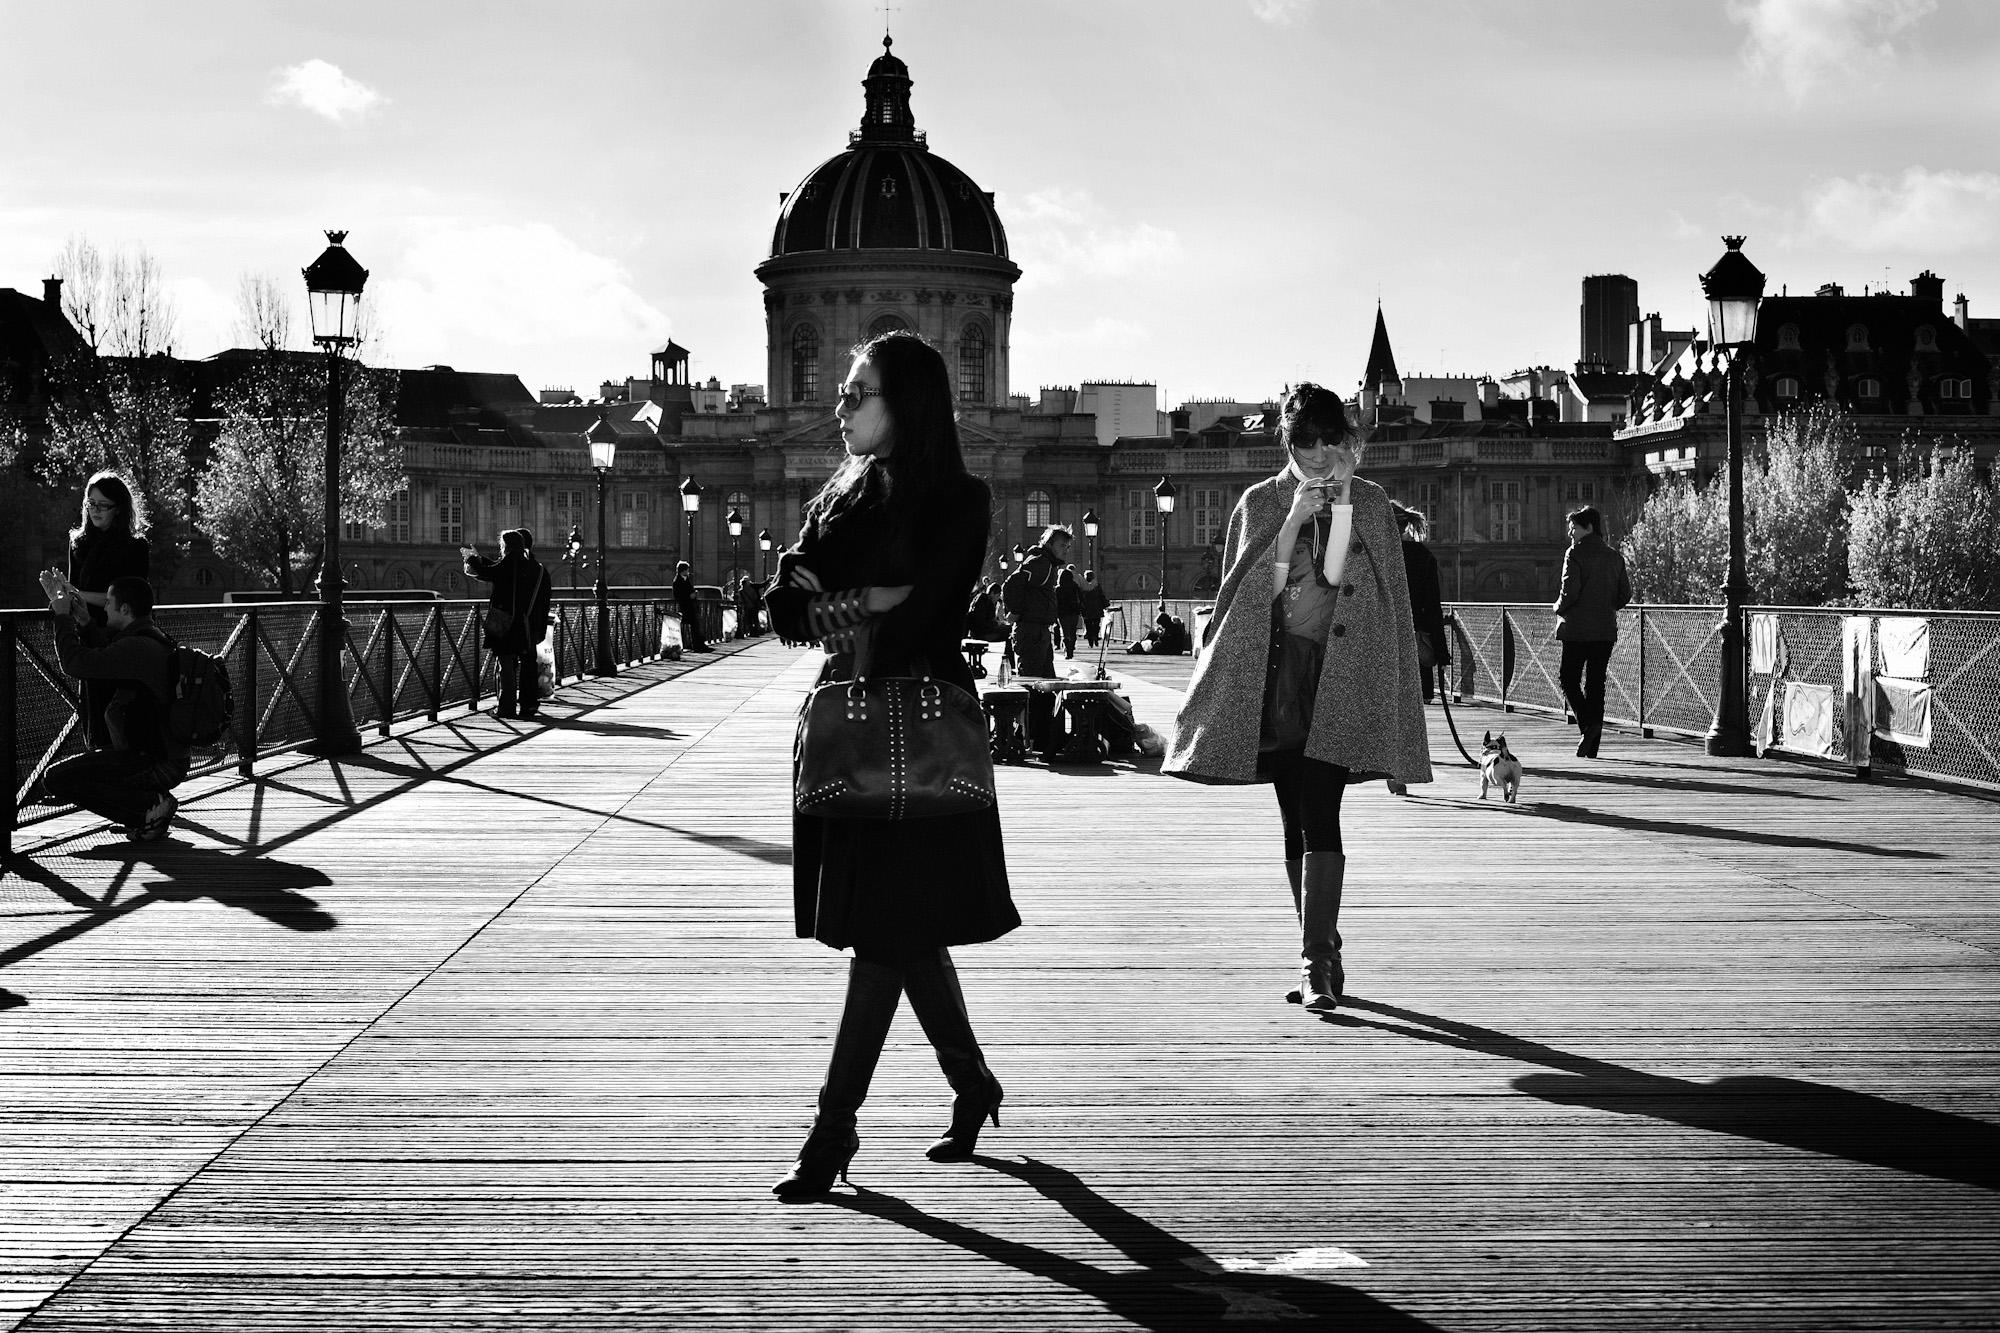 Pont_des_Arts_Paris.jpg